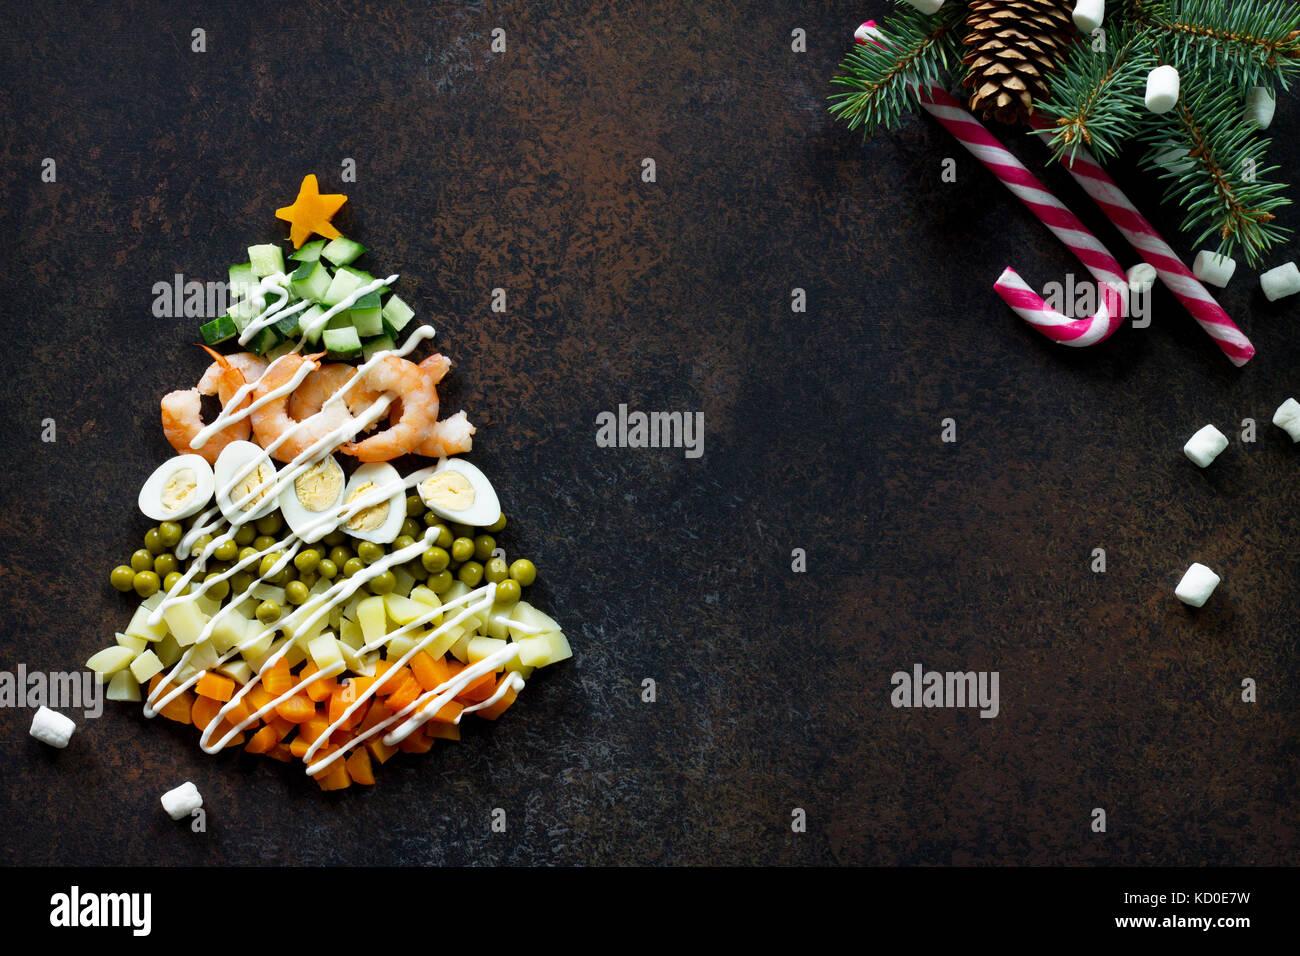 Dressing Christmas Tree Stock Photos & Dressing Christmas Tree ...